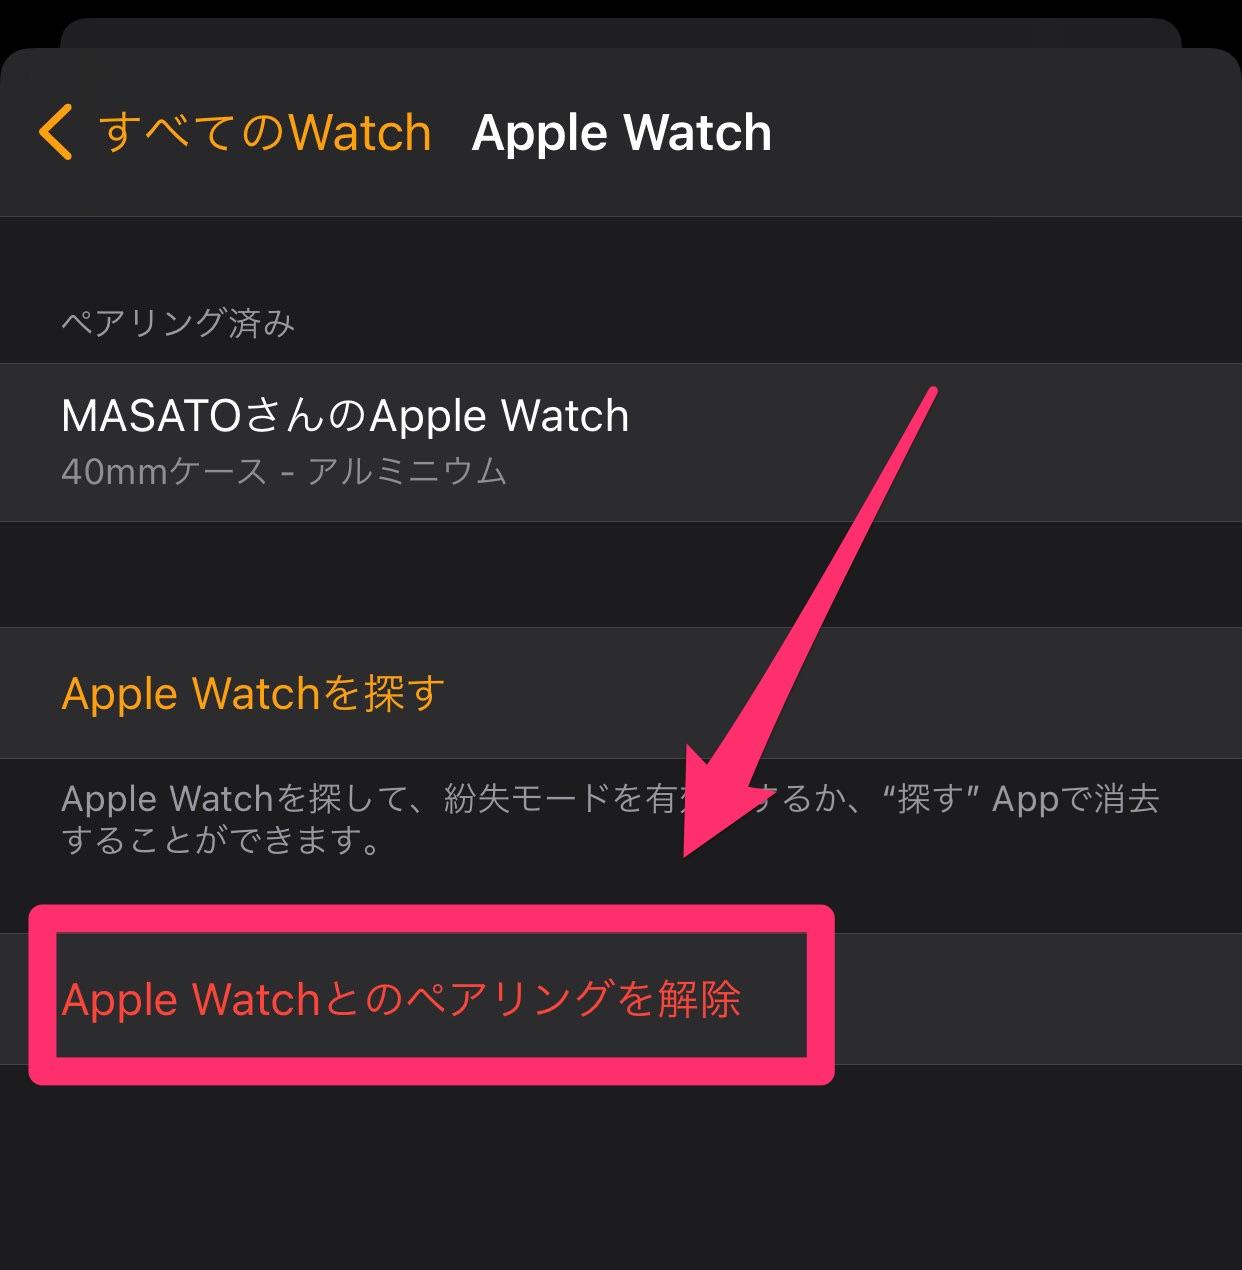 【Apple Watch 6】機種変更しようとしていきなり失敗した話【my new gear...】 22 14 04